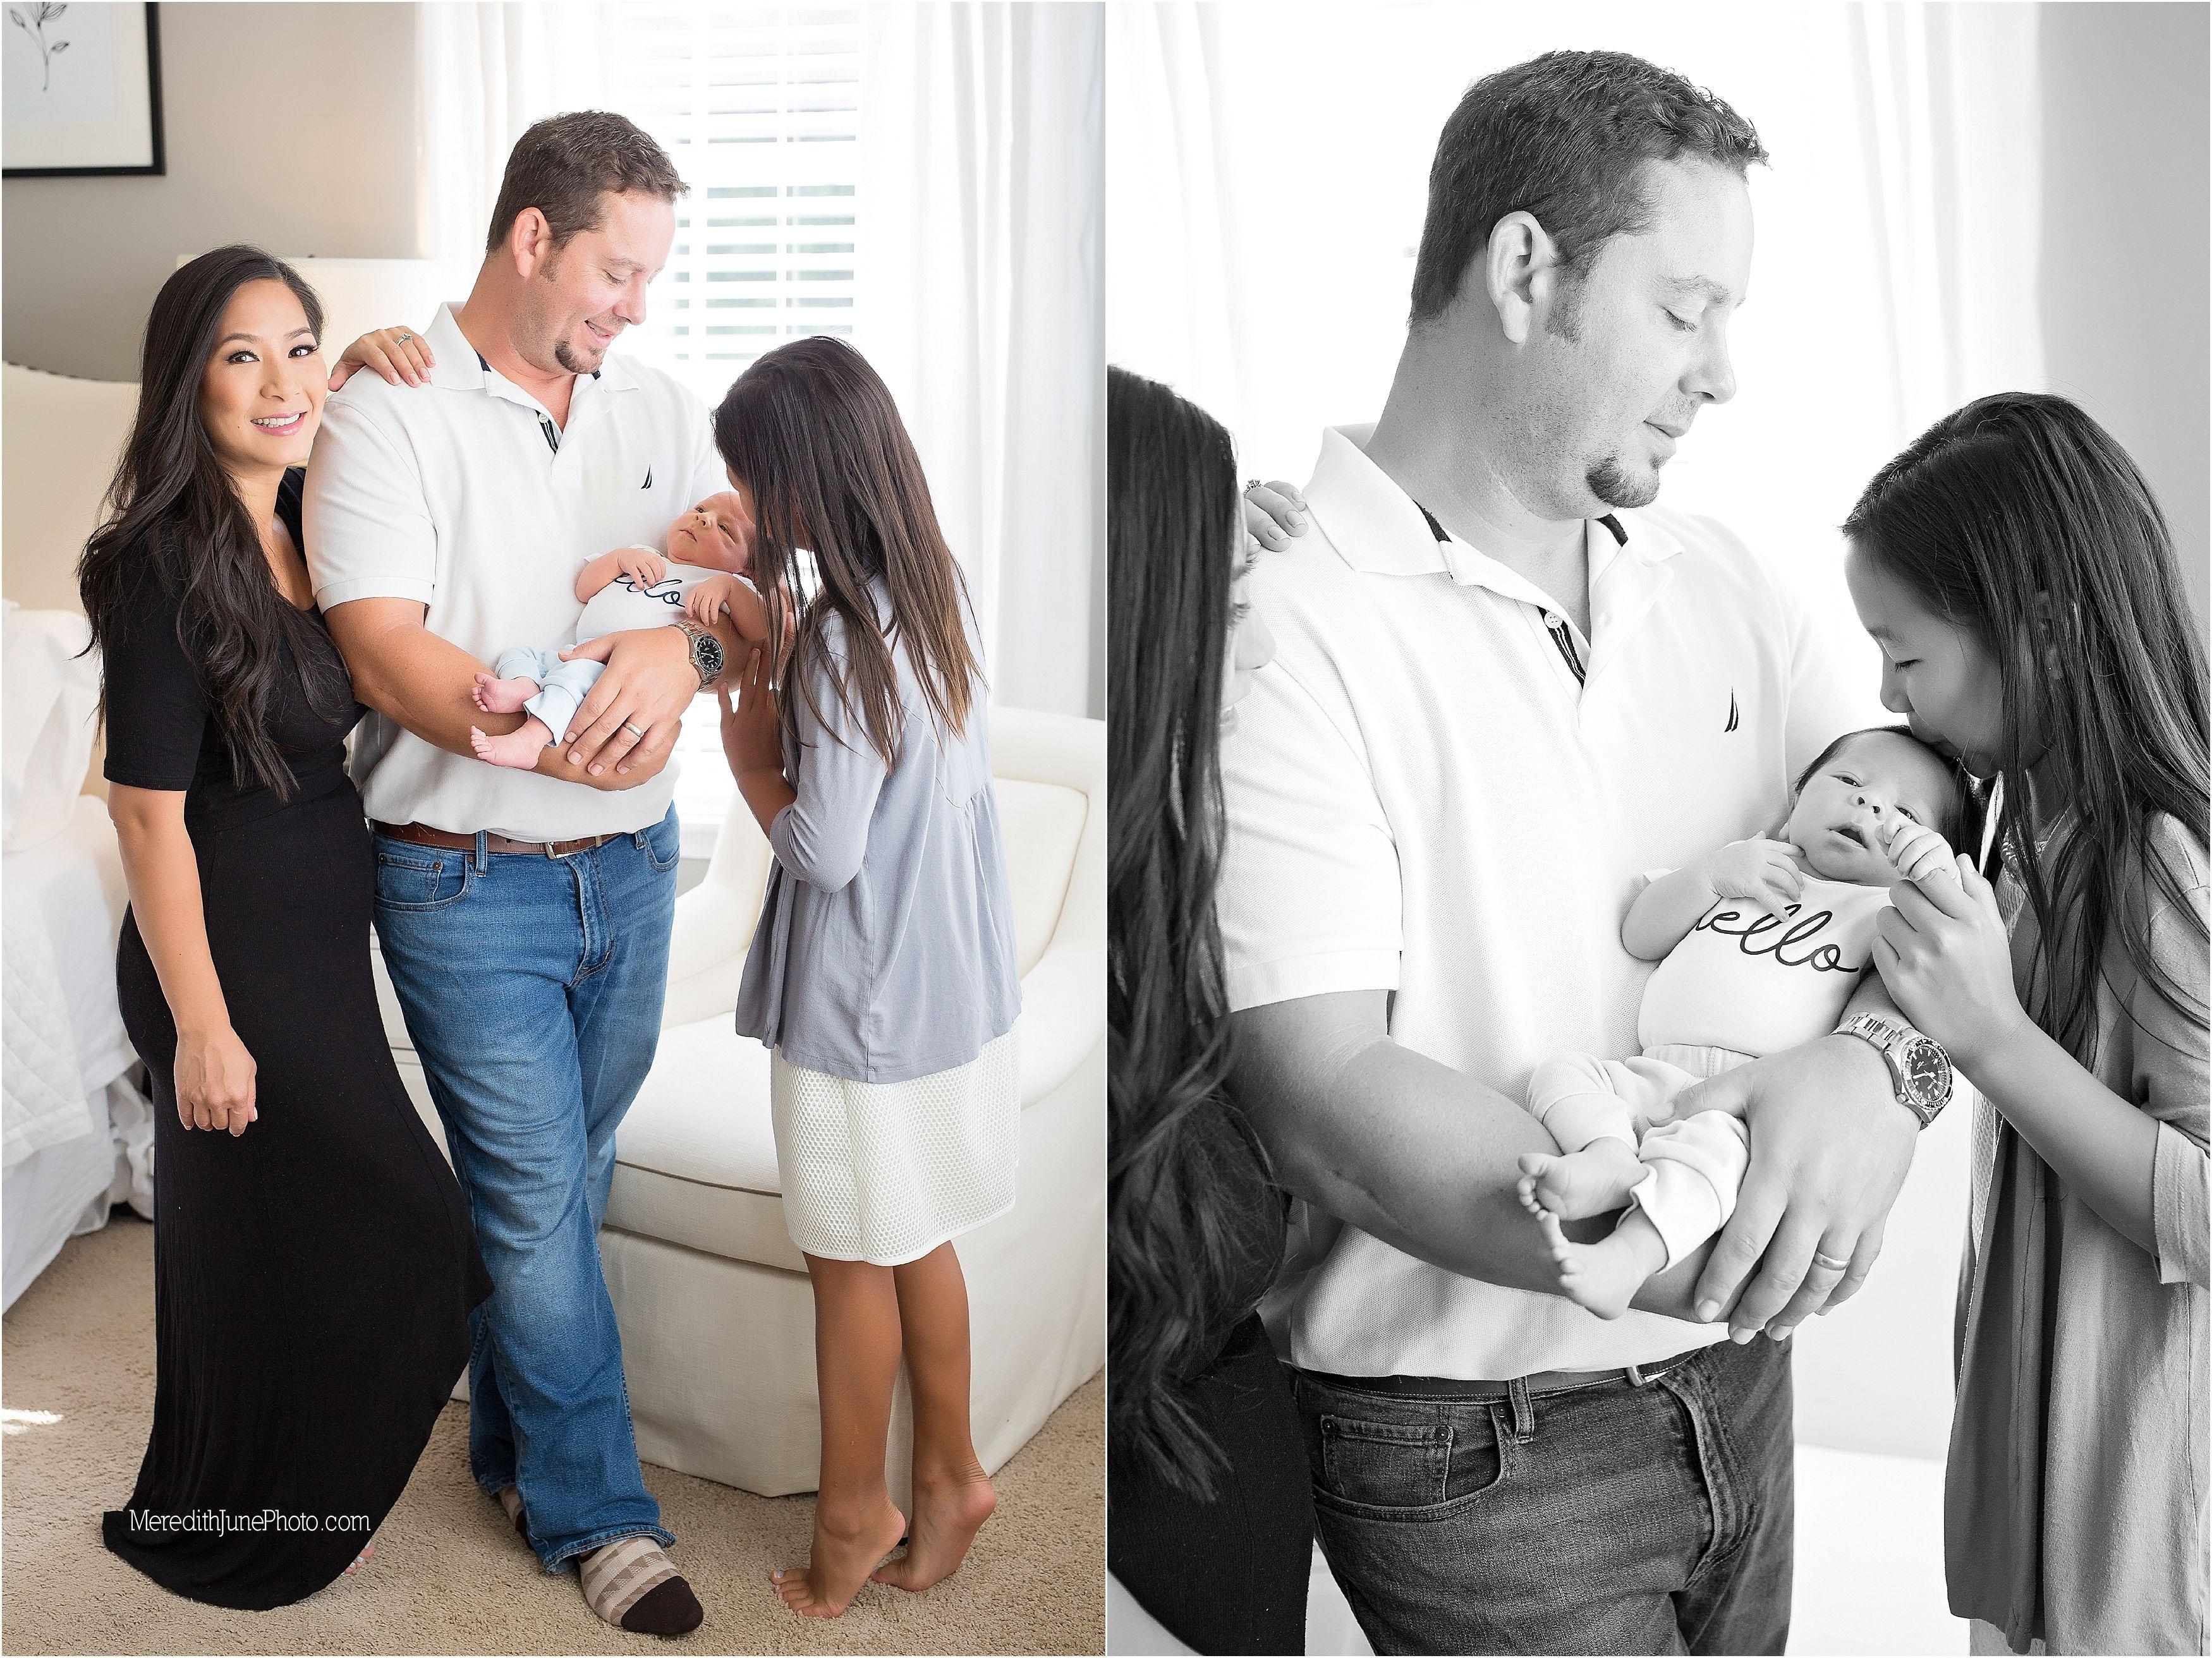 Best lifestyle photographer charlotte nc baby boy family family photography family photoshoot family posing ideas newborn family photoshoot newborn